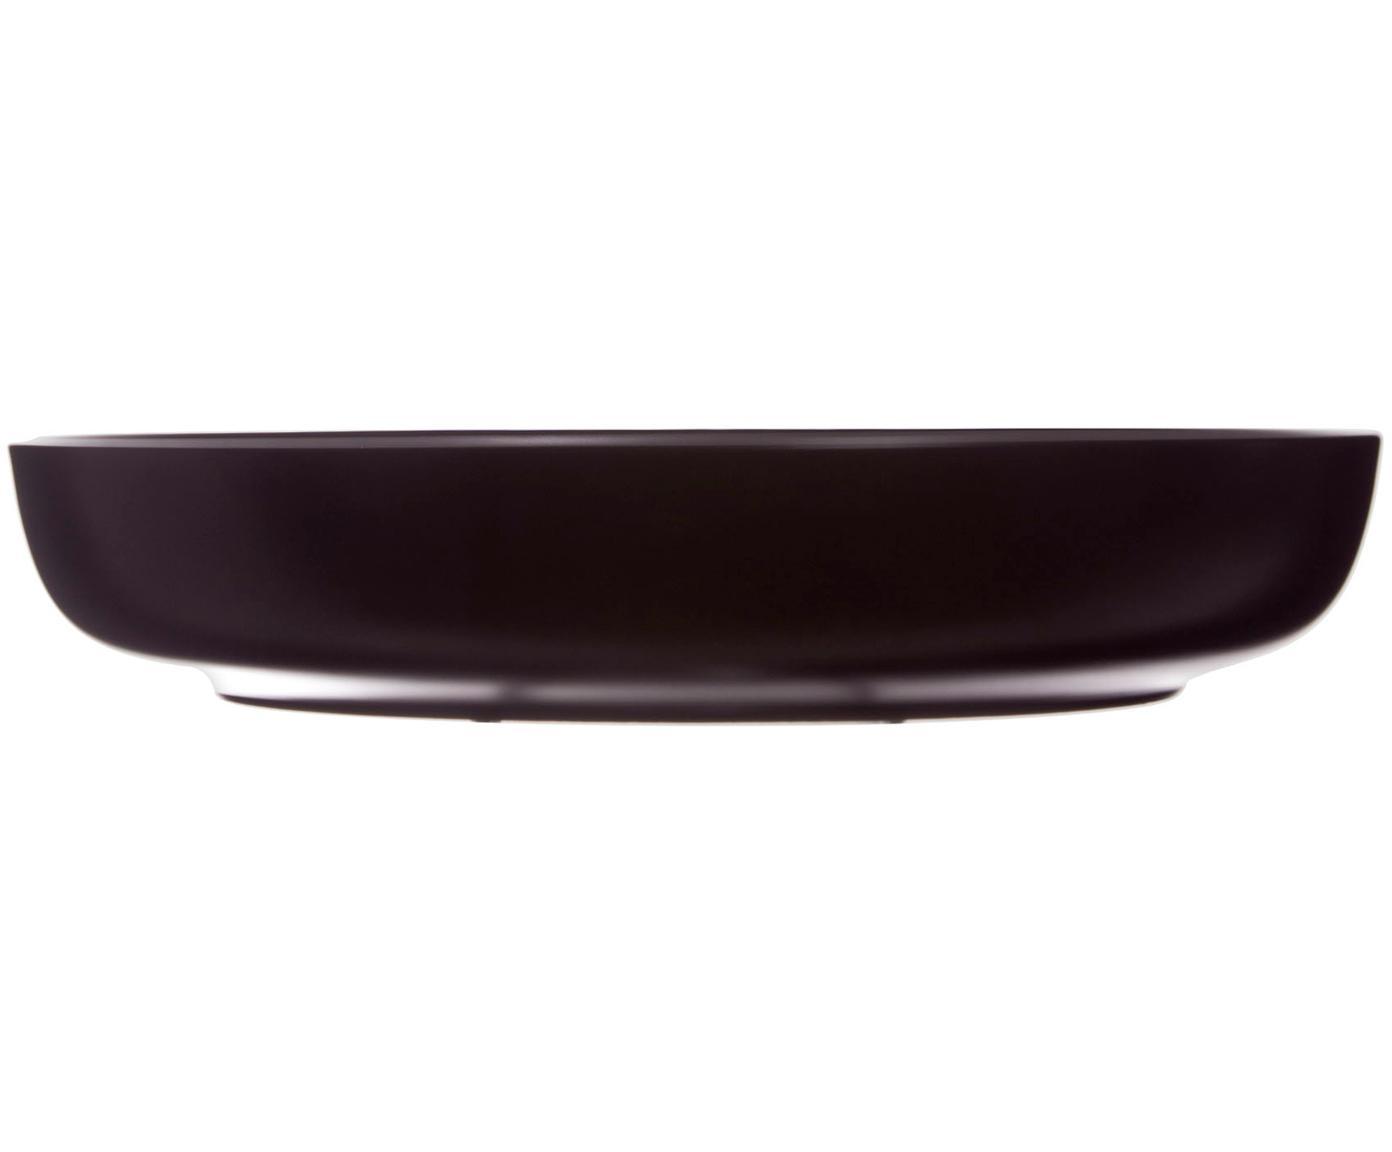 Platos hondos Okinawa, 6uds., Cerámica, Negro, mate, Ø 22 x Al 4 cm